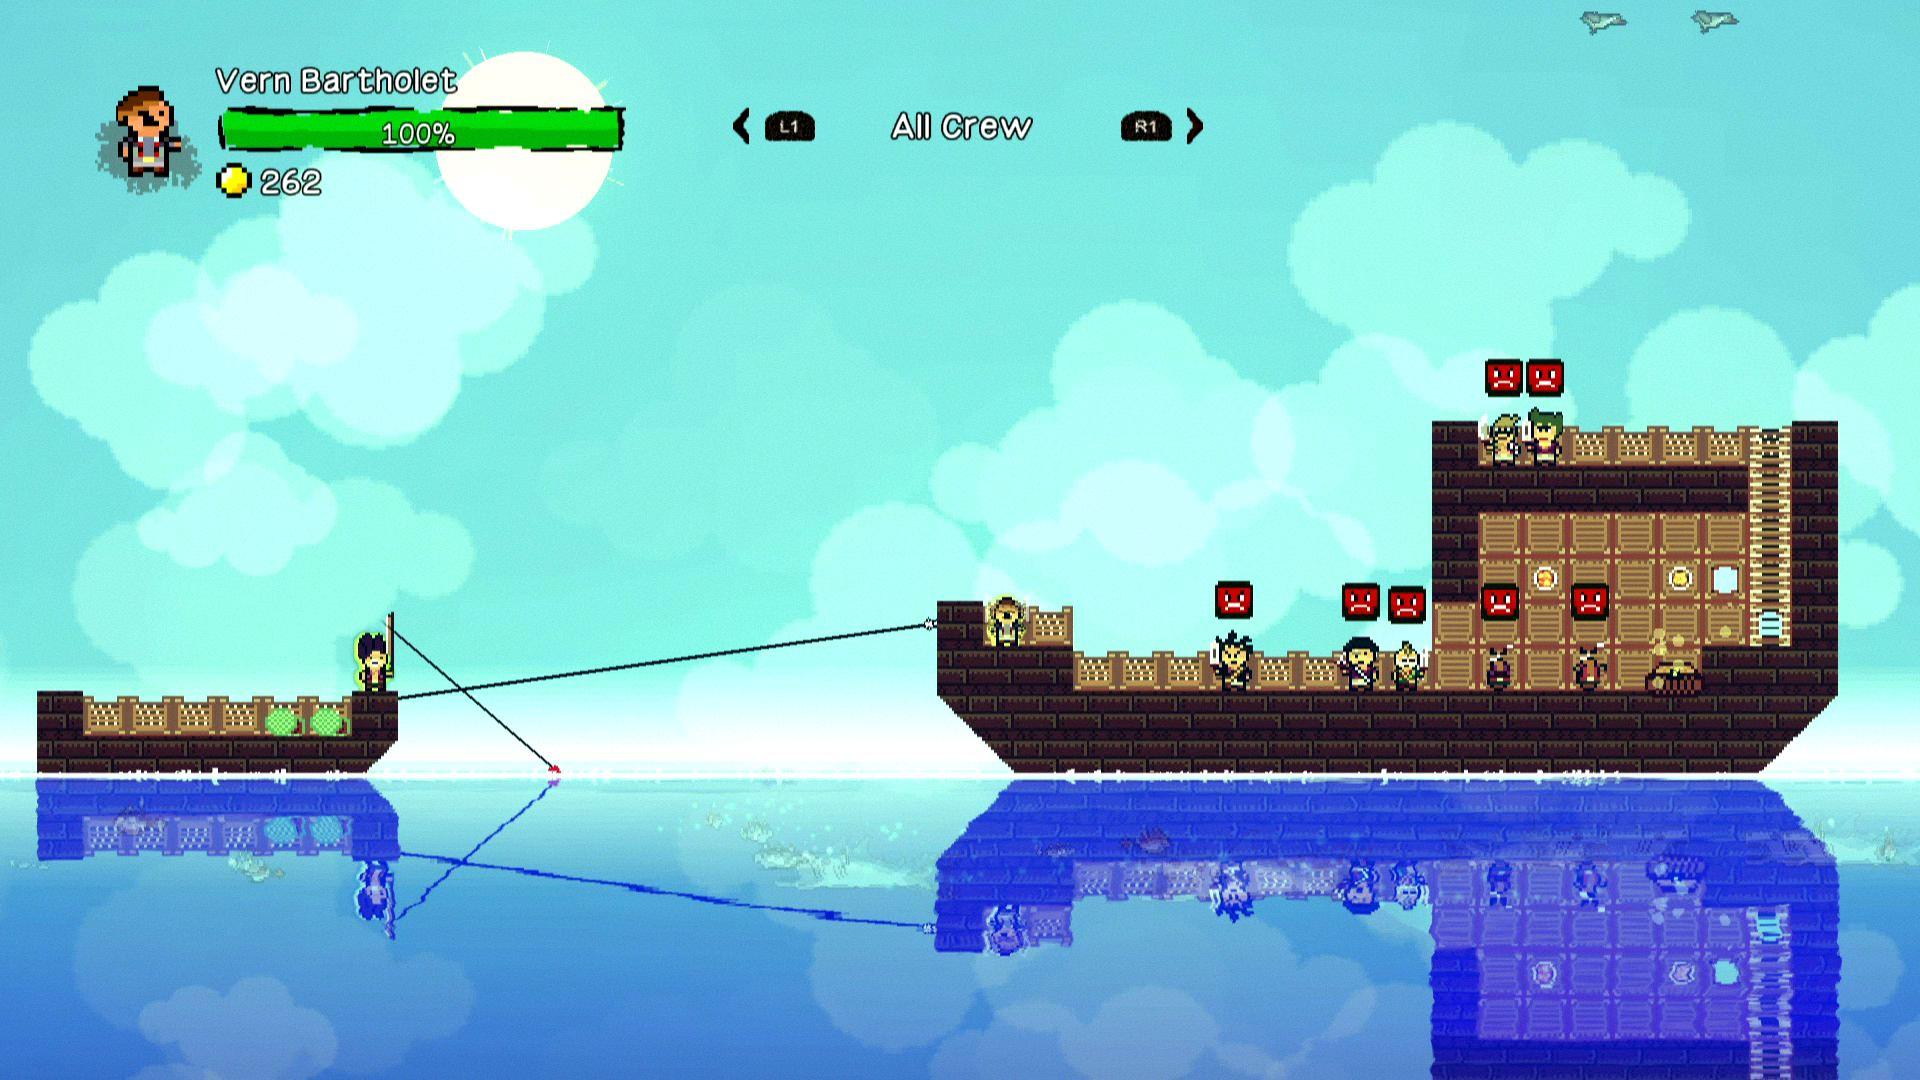 Pixel Piracy Bild 17 playmde